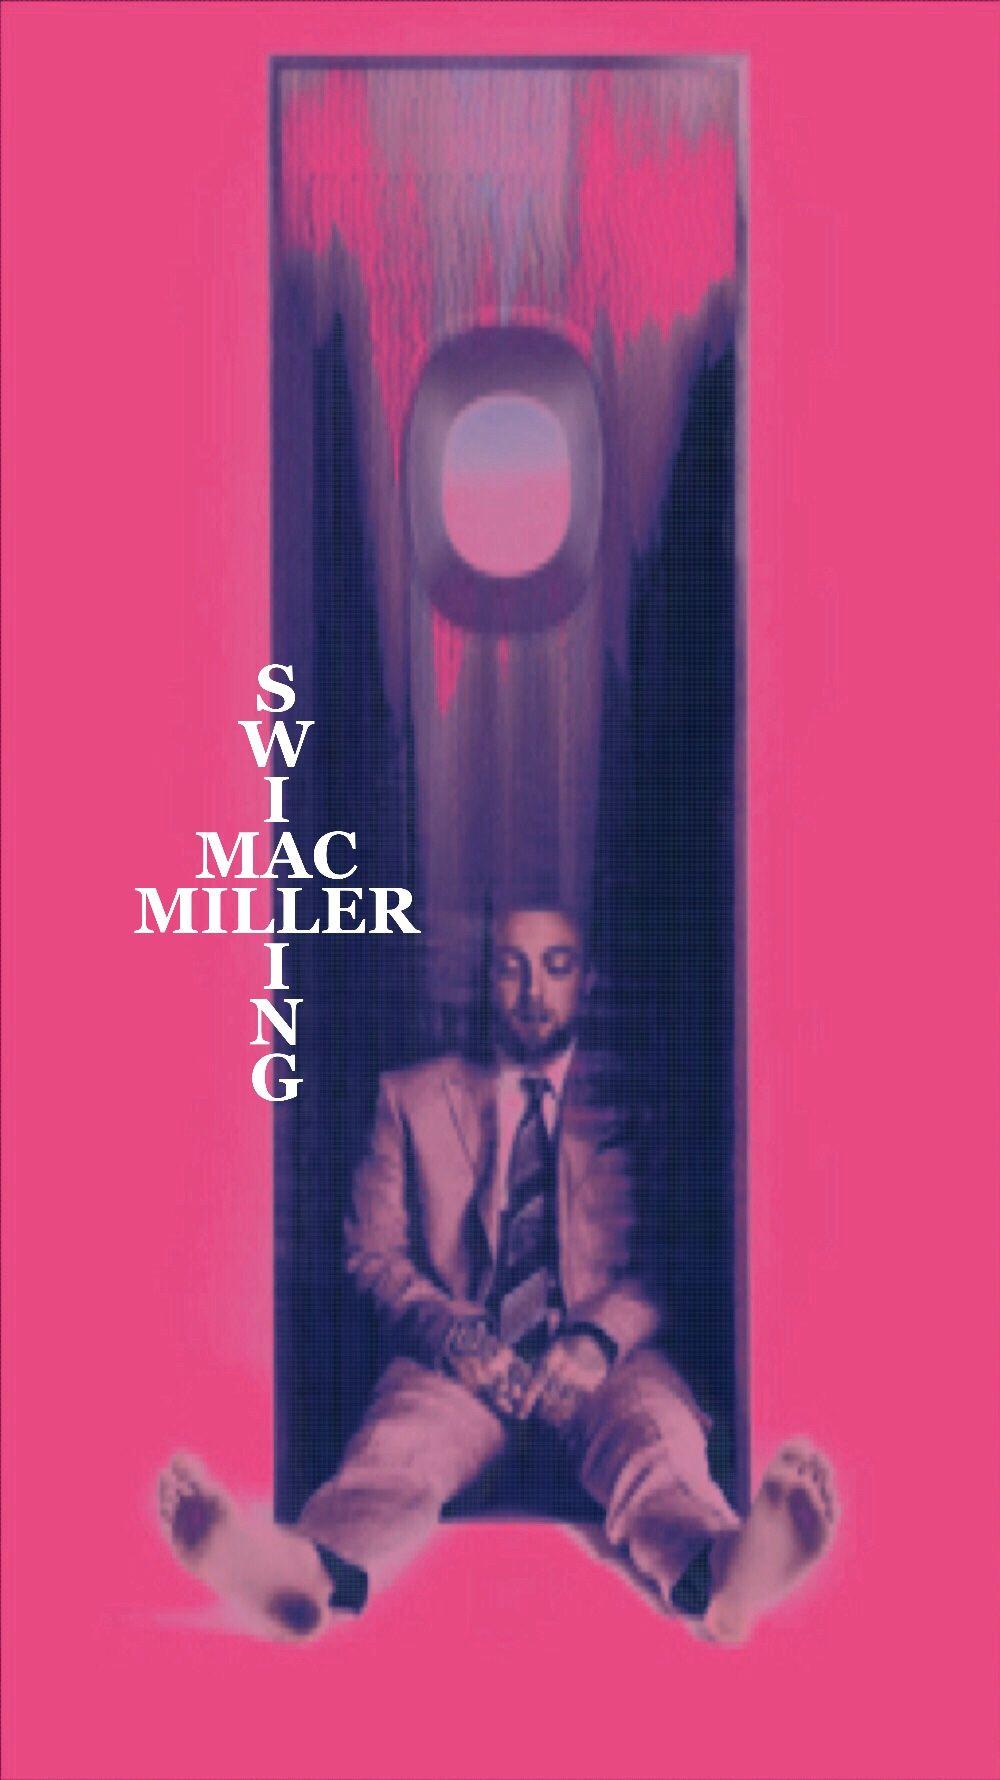 Macmiller Swimming Mac Miller Pastel Pink Aesthetic Pink Aesthetic